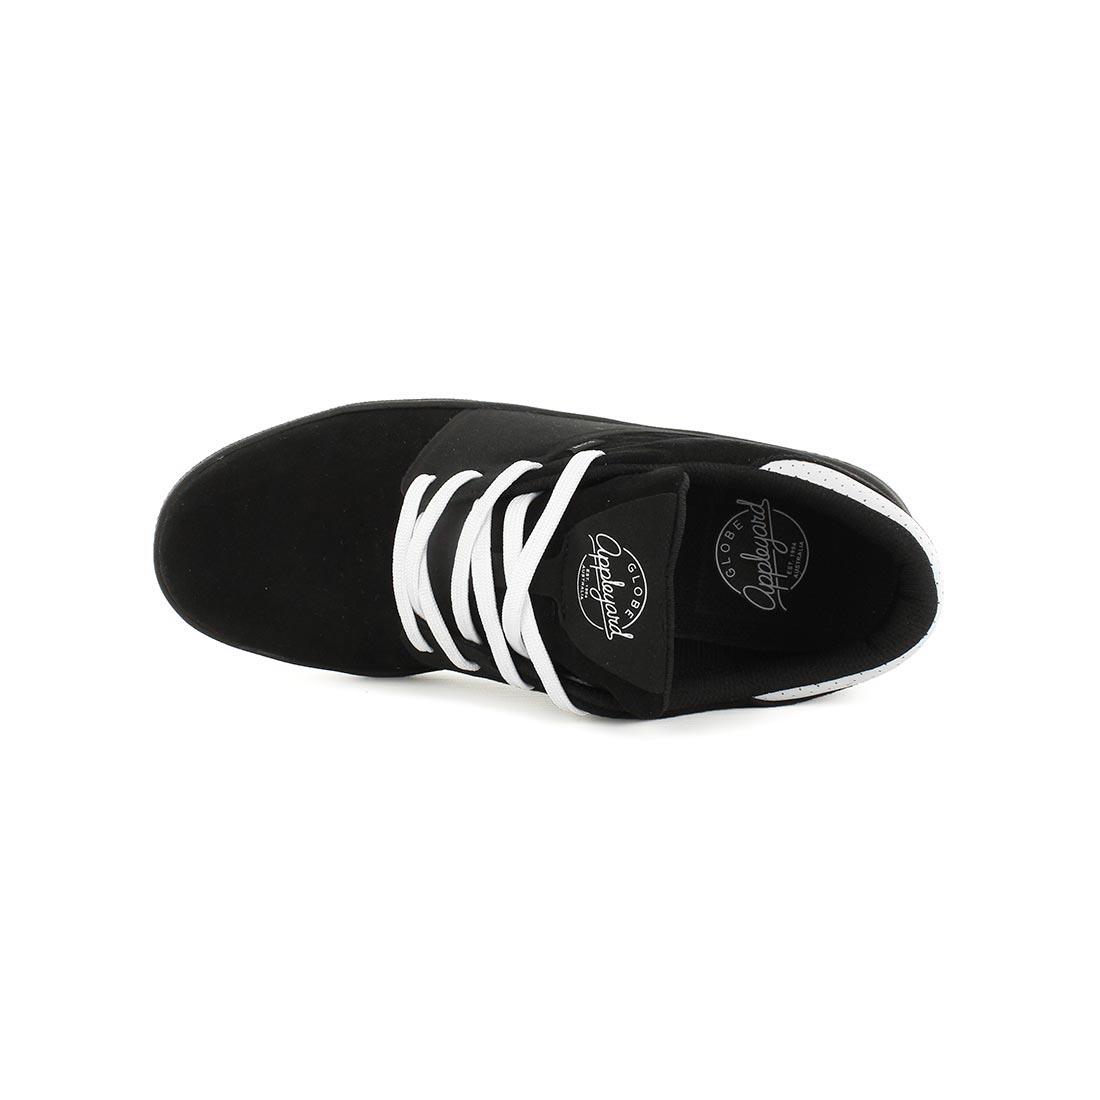 Globe Shoes Mahalo SG - Black Gum